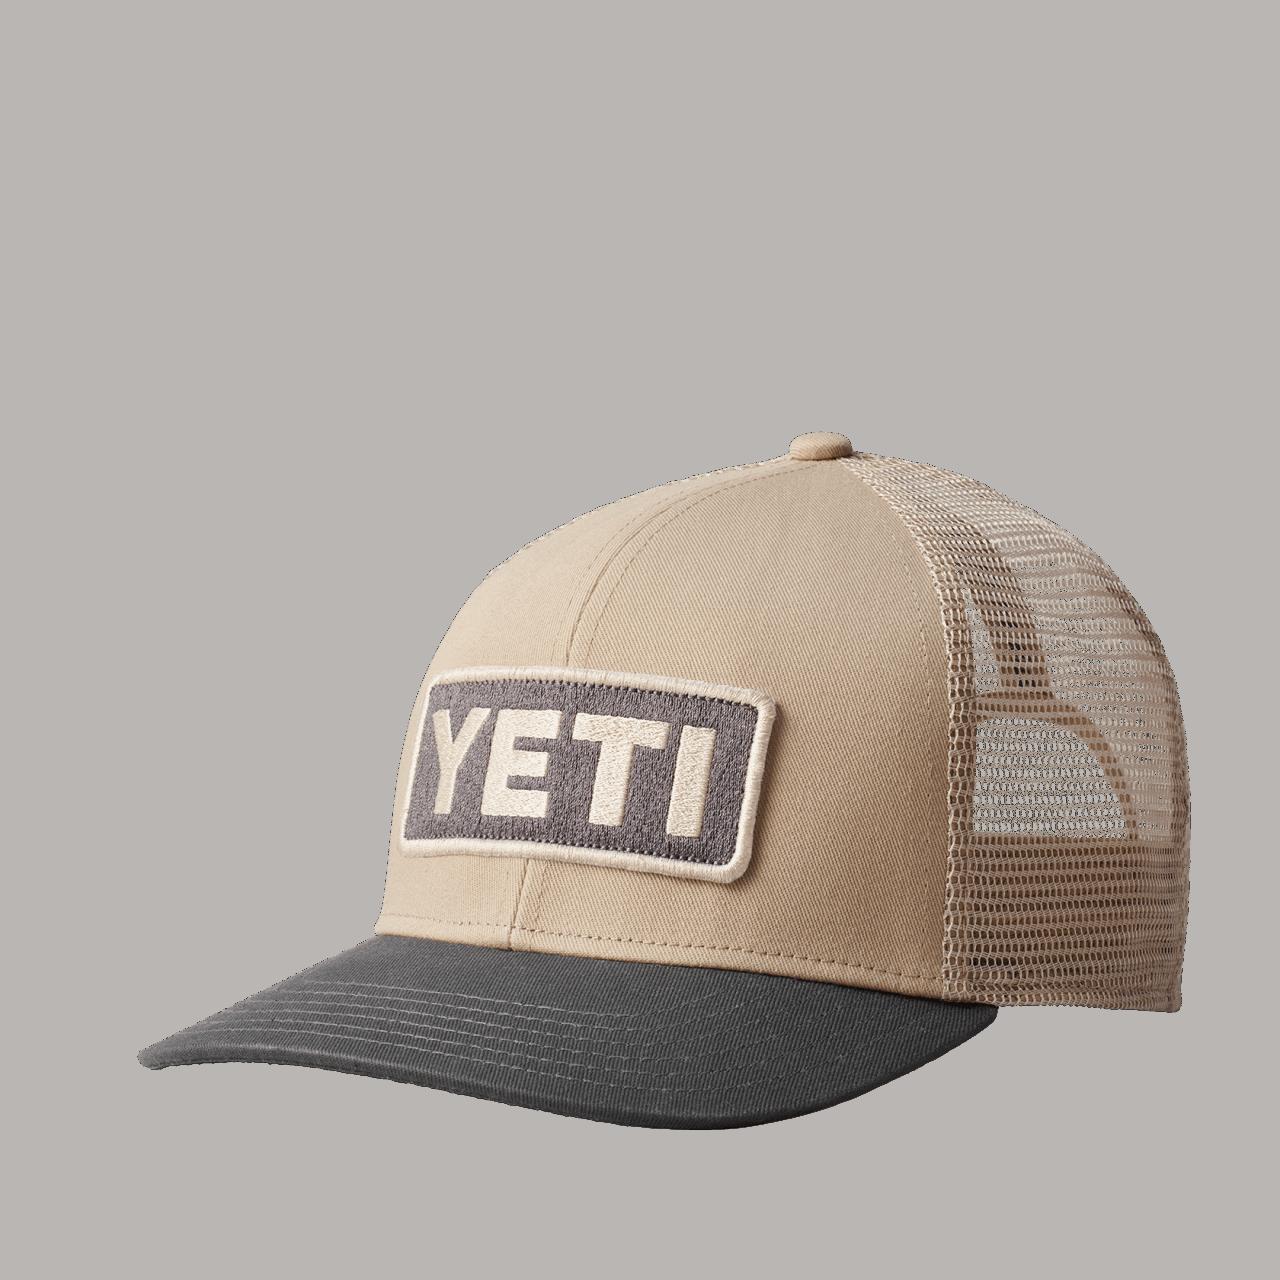 YETI Logo Badge Trucker Hat - grey/taupe